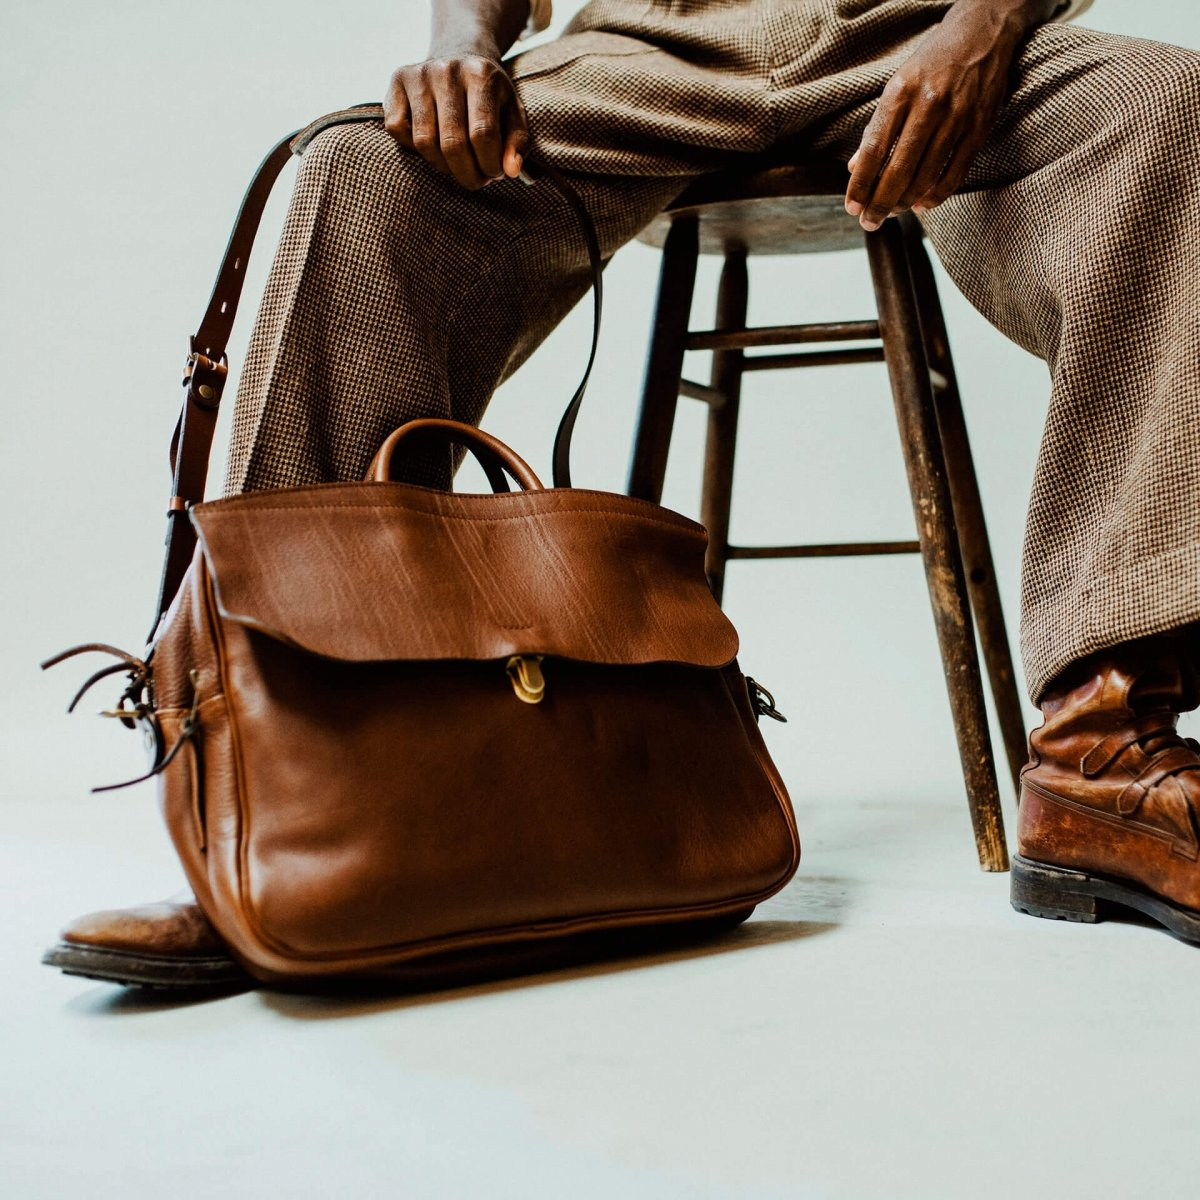 Zeppo Business bag - Cuba Libre / E Pure (image n°9)